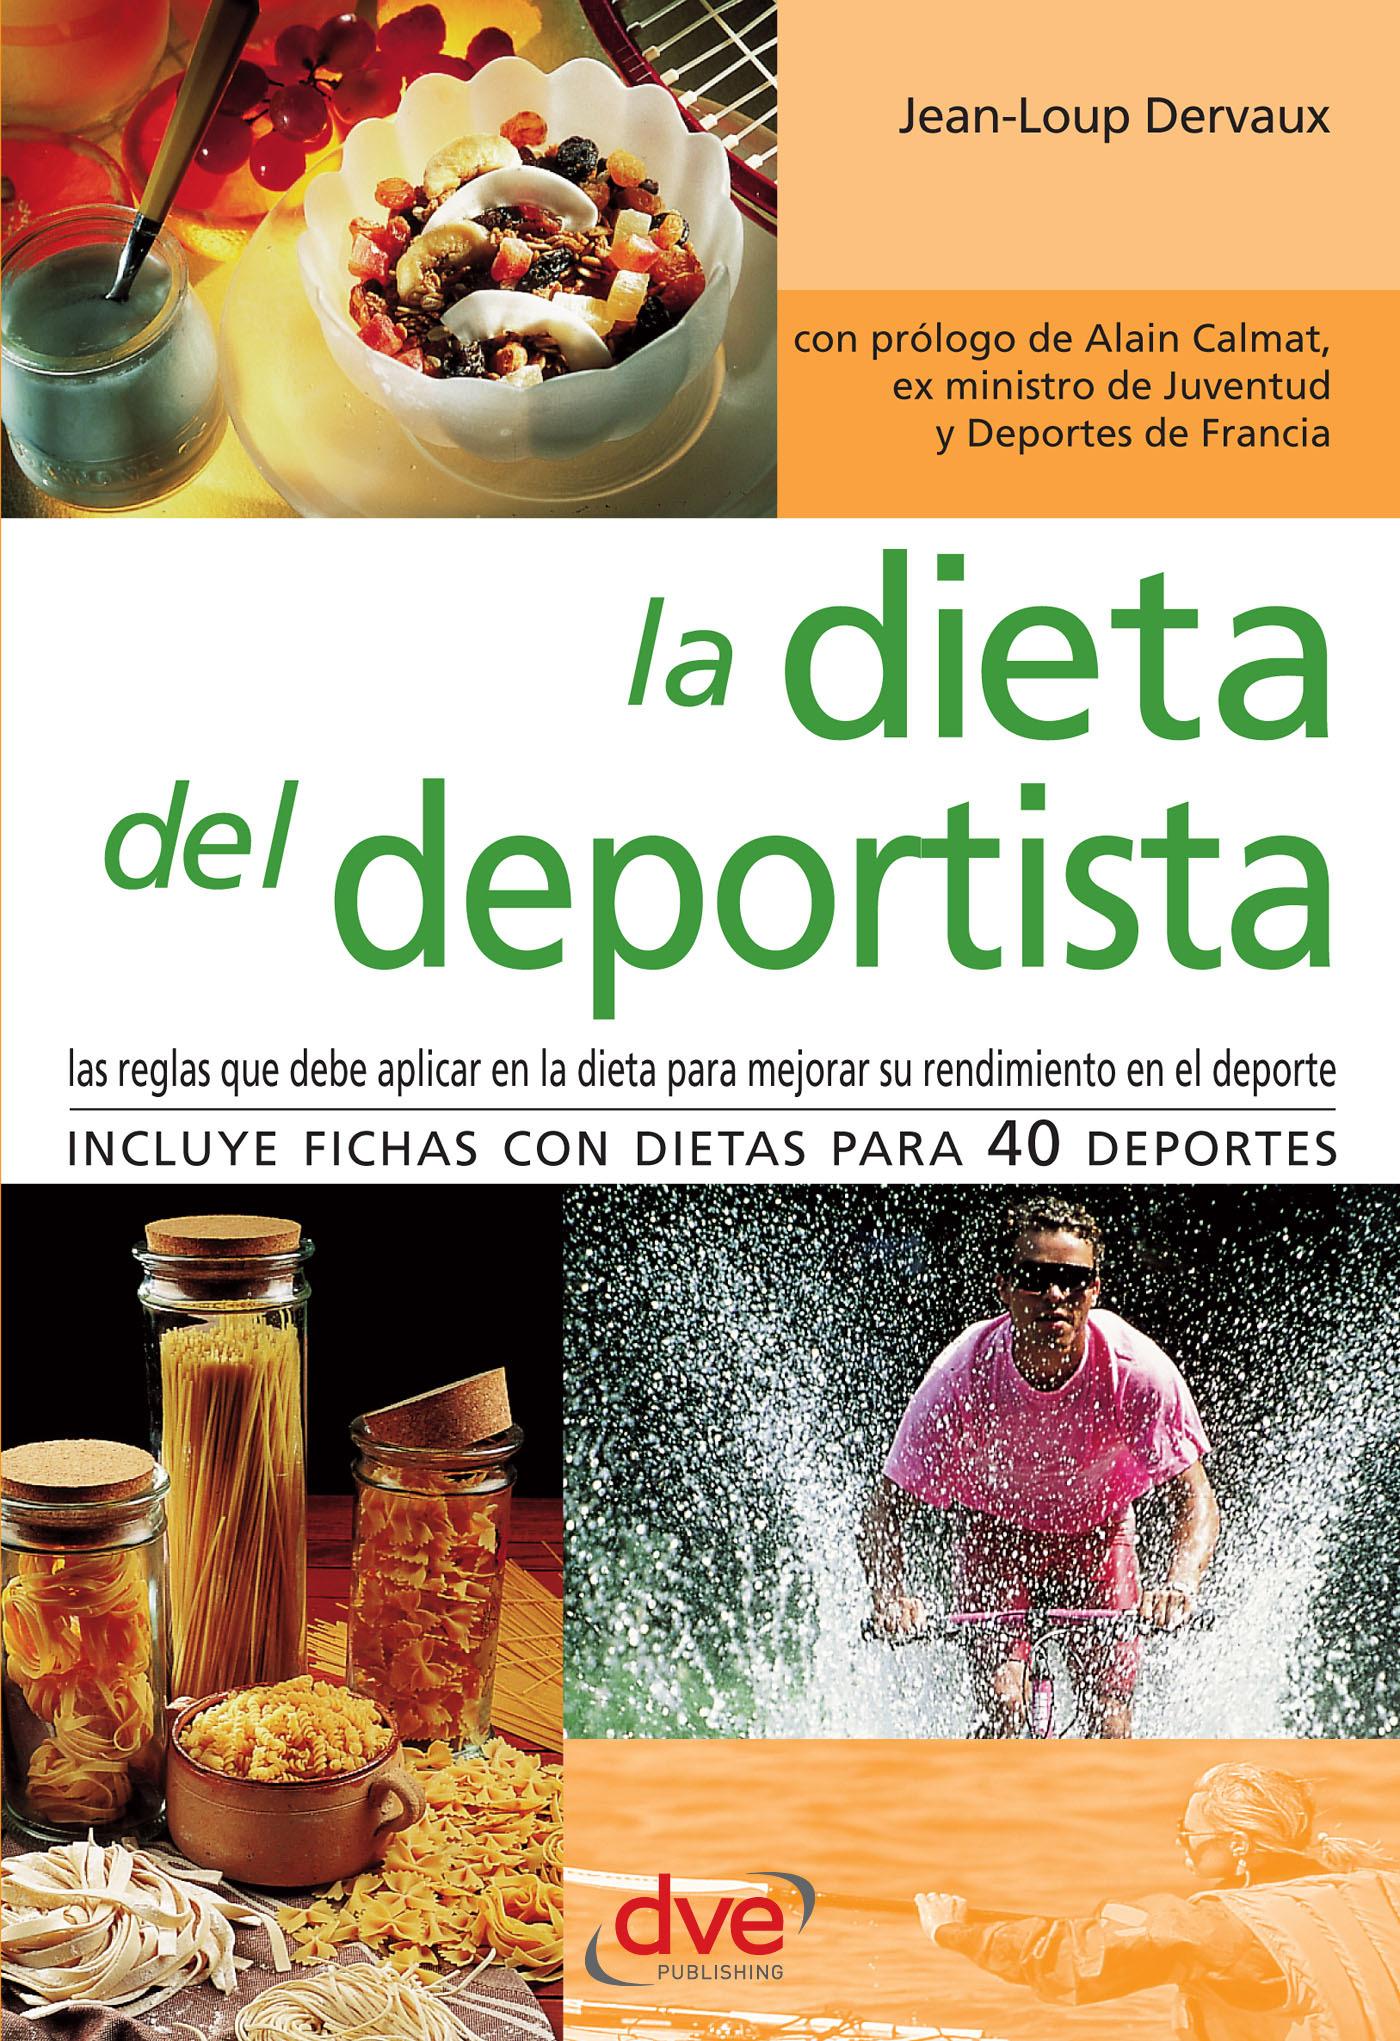 Calmat, Alain - La dieta del deportista, ebook